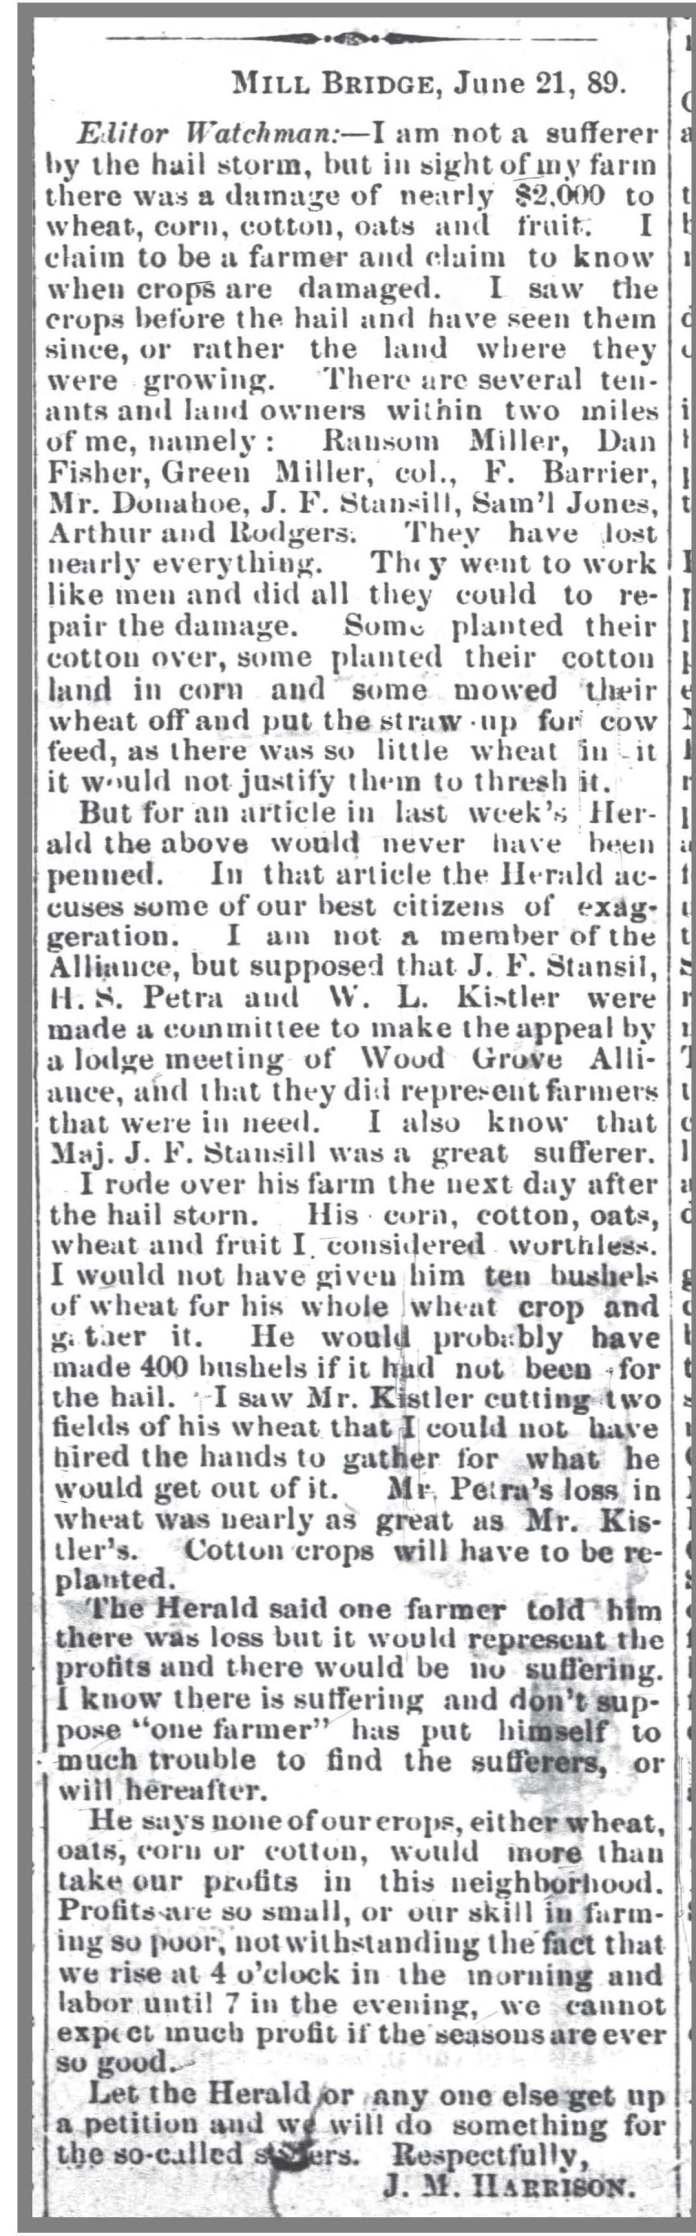 Carolina_Watchman_6_27_1889_hailstorm_ransom_miller